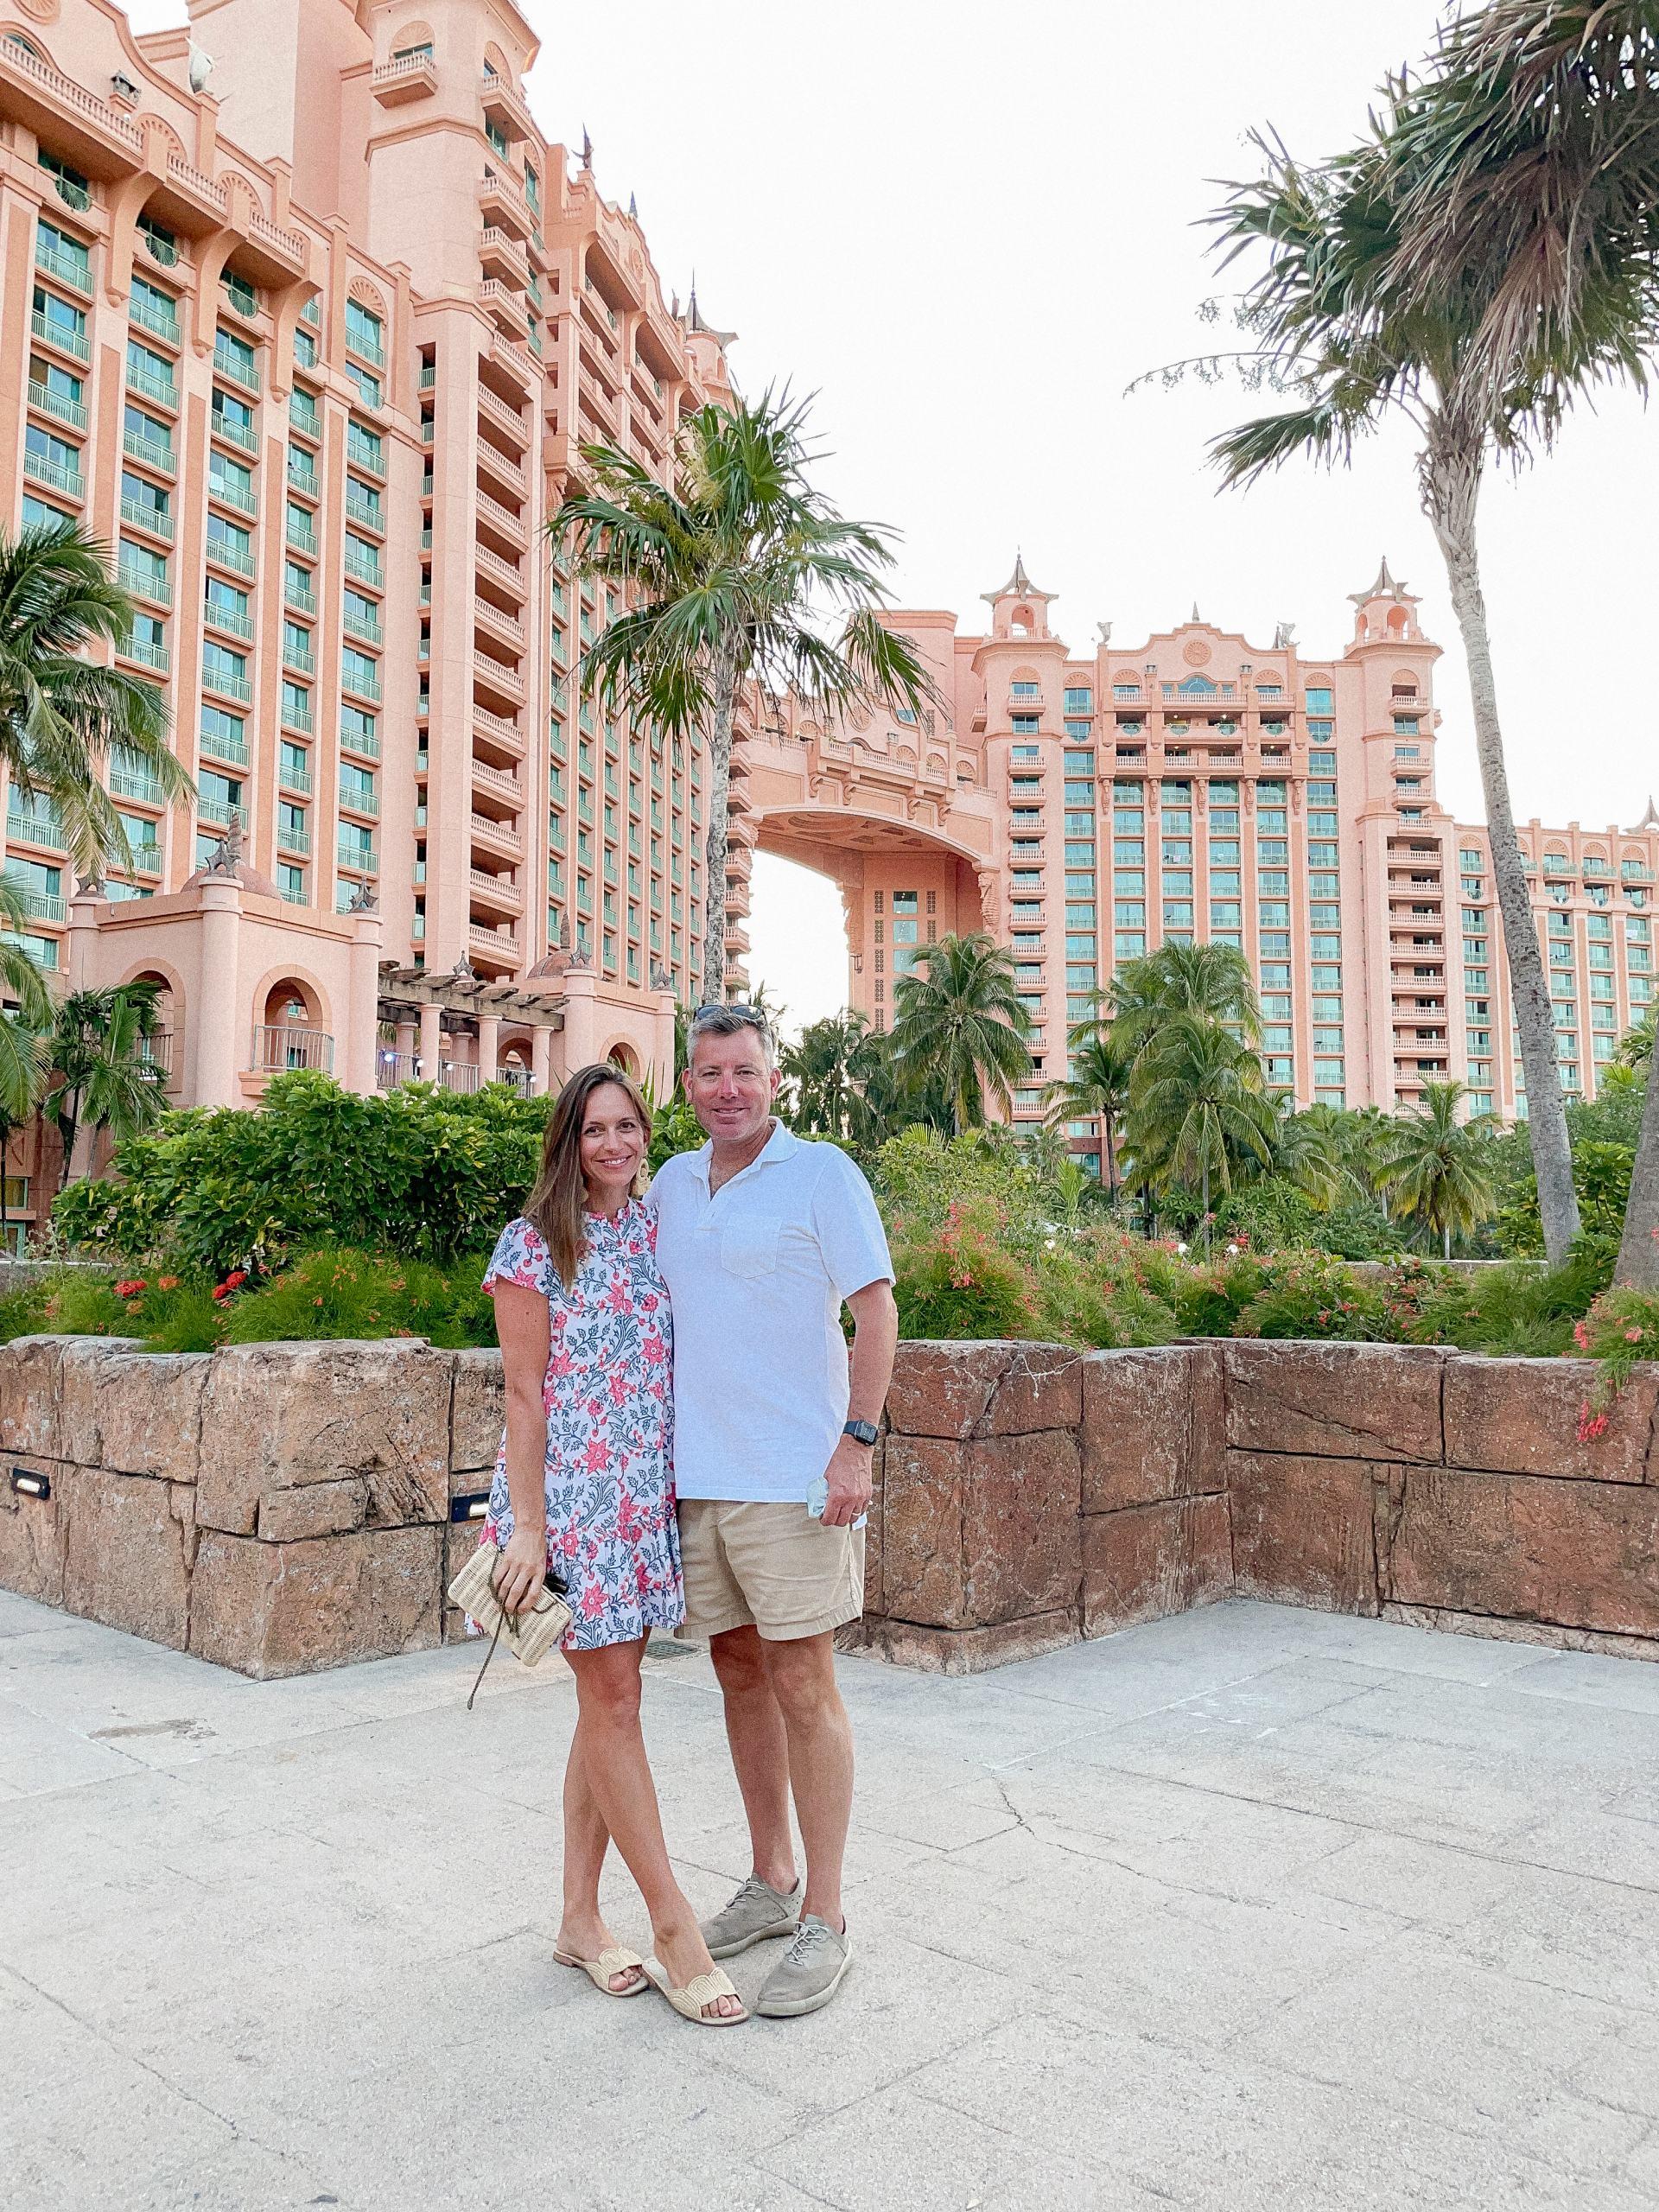 atlantis resort - madison mathews dress - folly mini dress - raffia sandals - rattan clutch - classic style - resort style